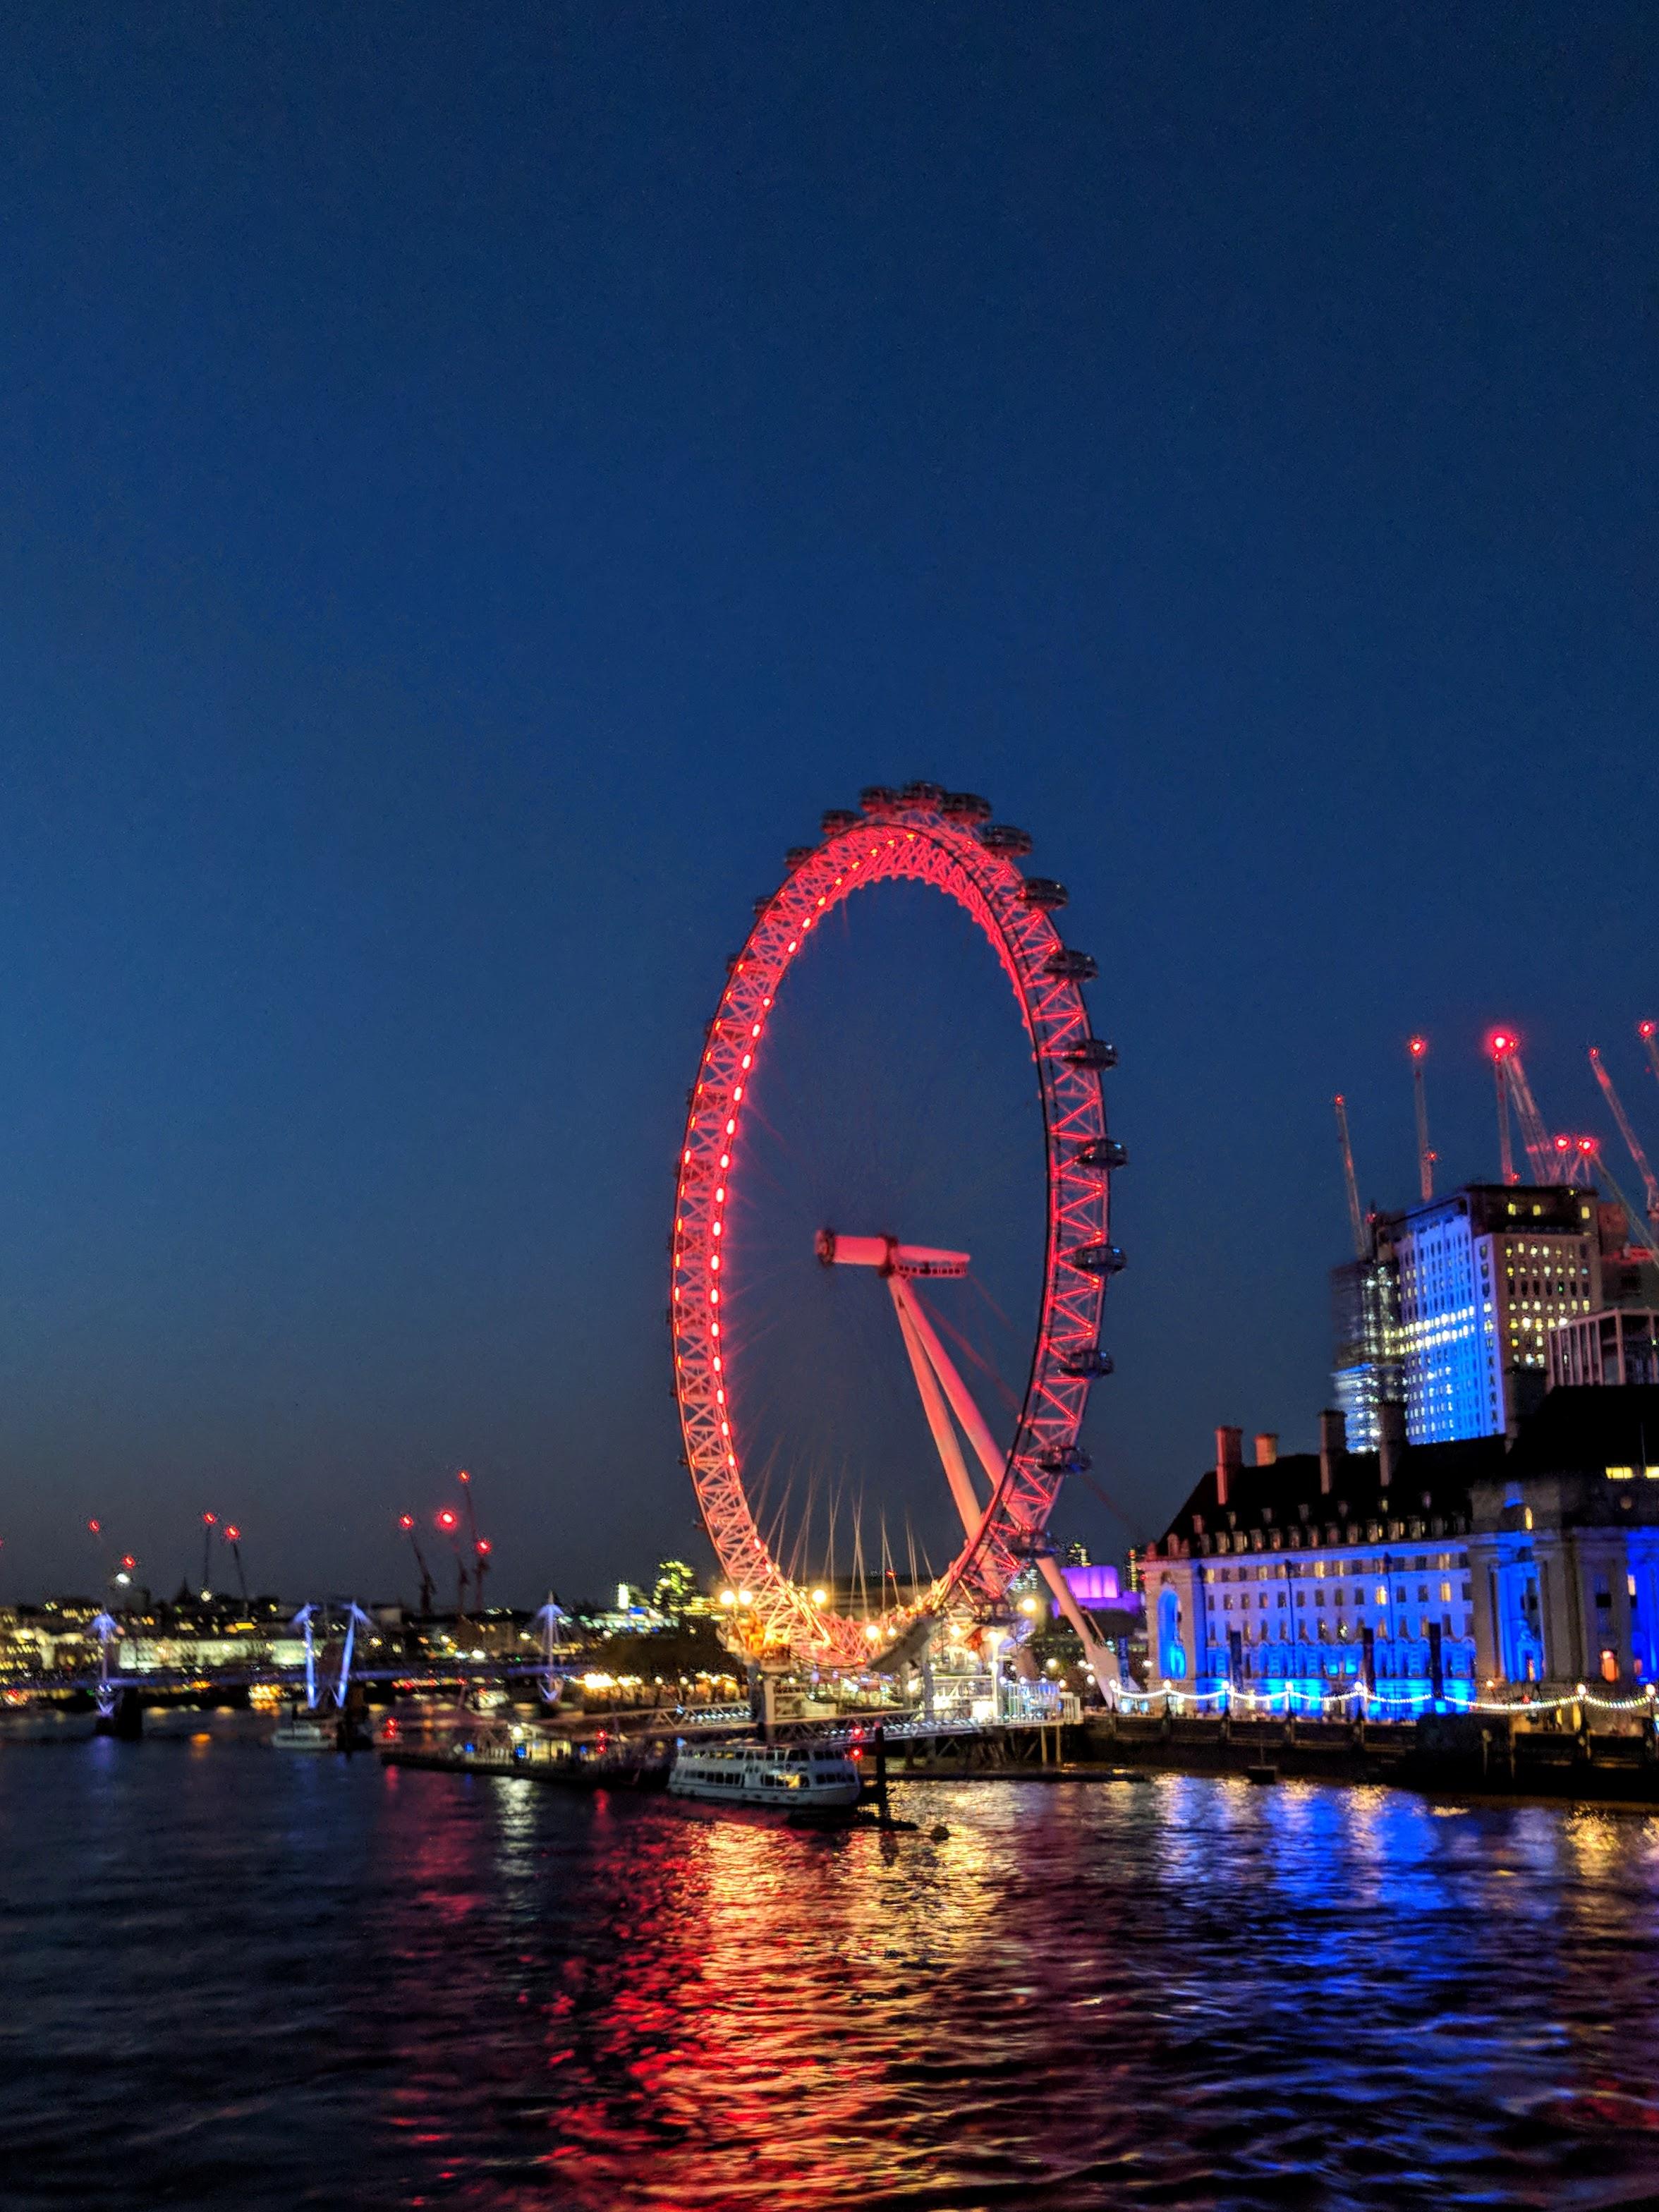 Megabus Open Top Sightseeing Tour Of London Sweet Monday